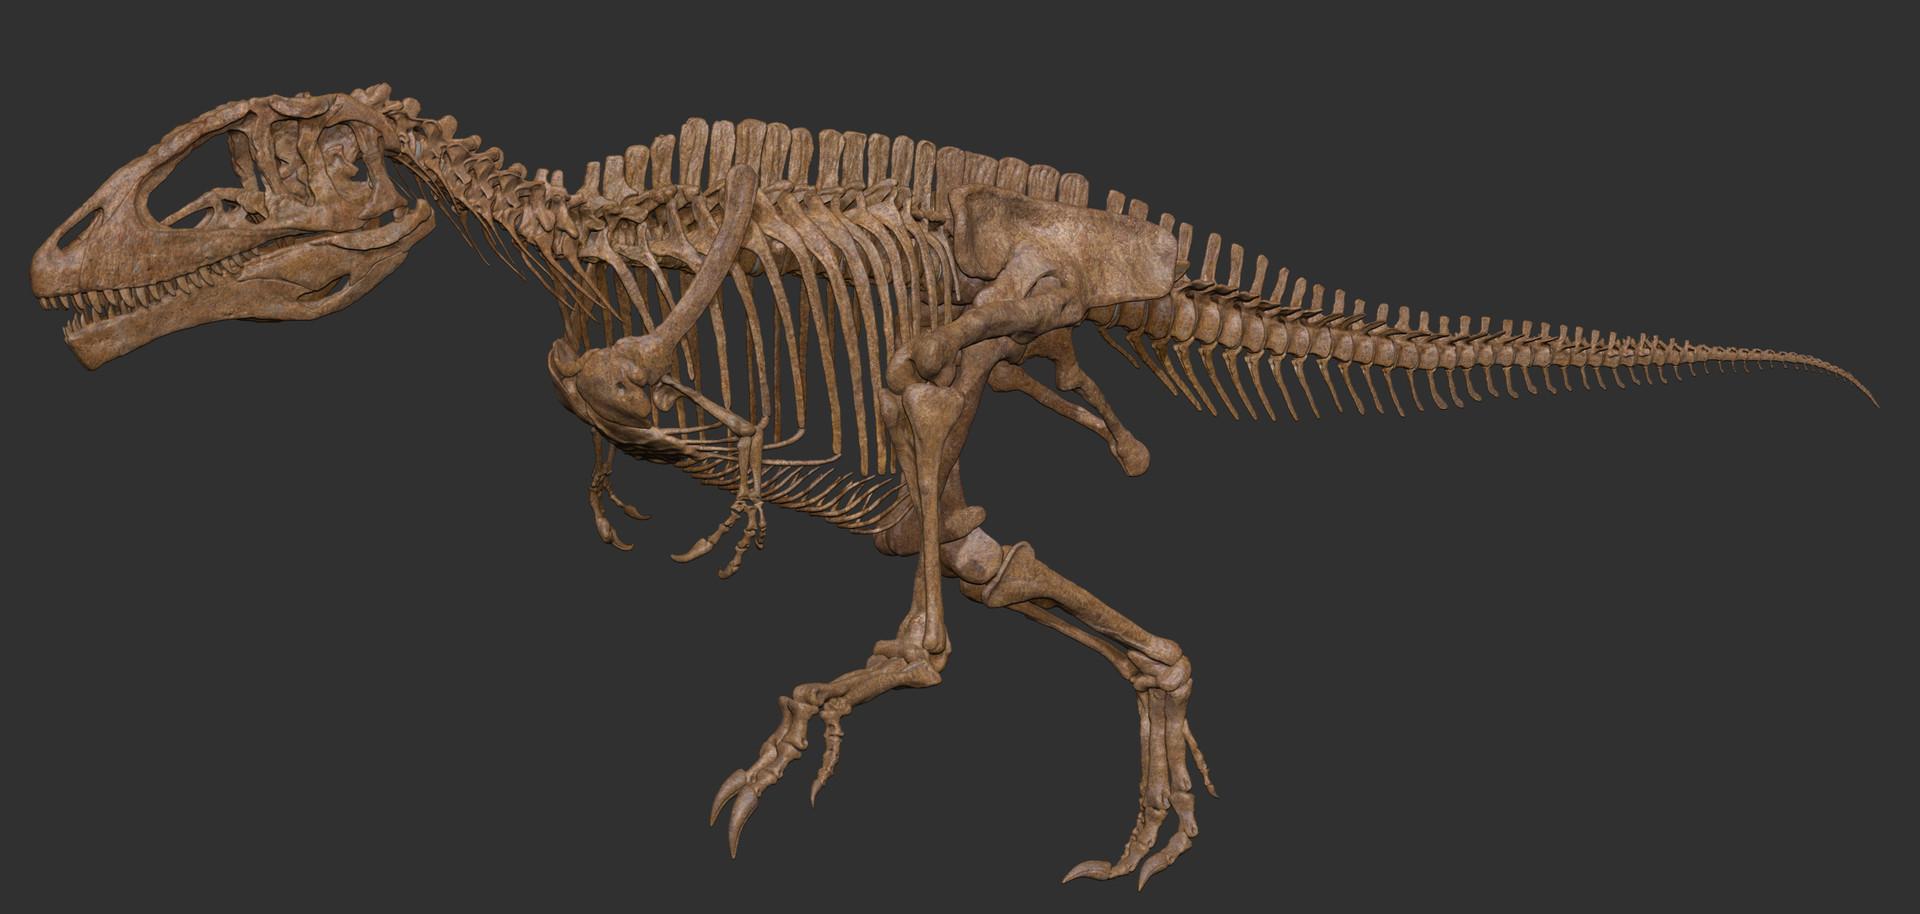 Vitamin Imagination Carcharodontosaurus Skeleton